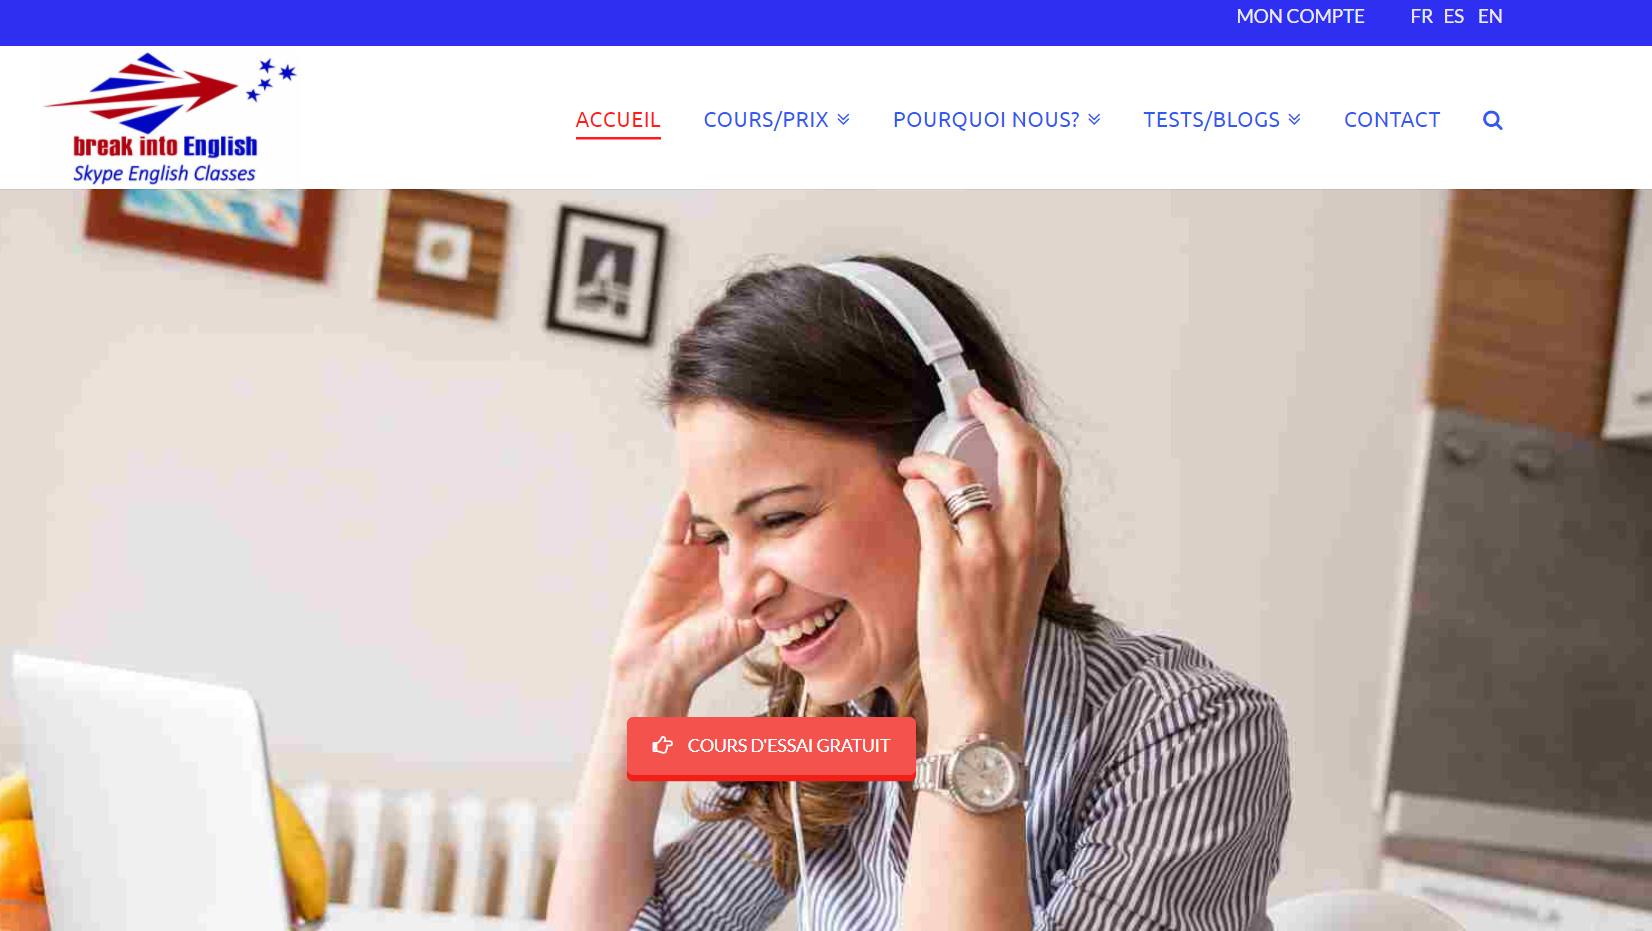 Apprendre l'anglais en ligne avec Skype